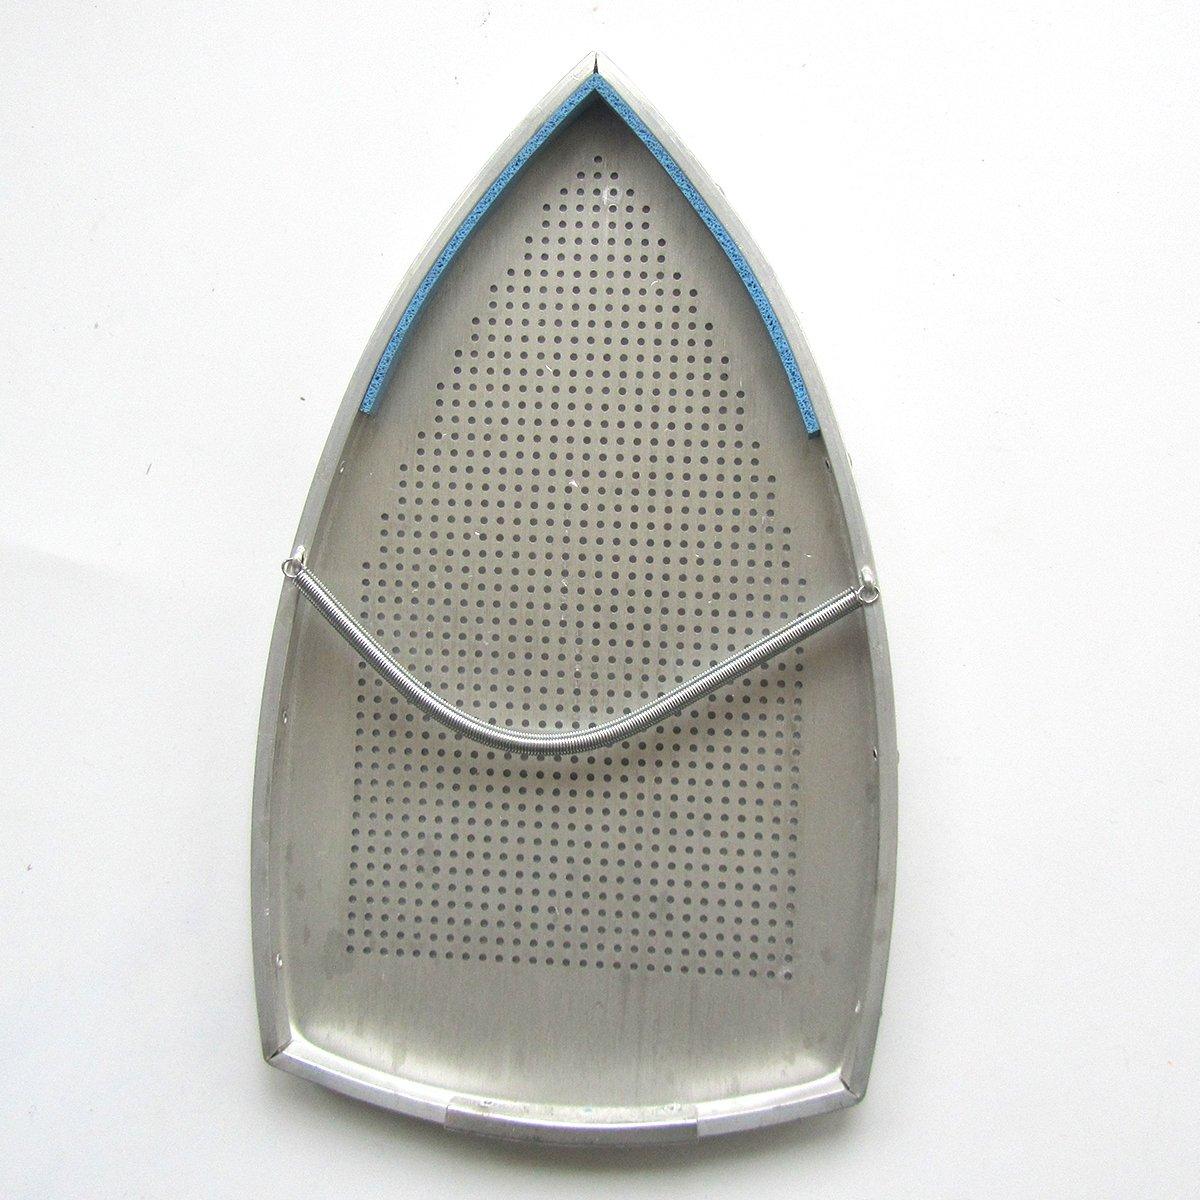 KUNPENG - Teflon Ironing Shoe for SilverStar #ES-85AF 1PCS Electric Steam Iron